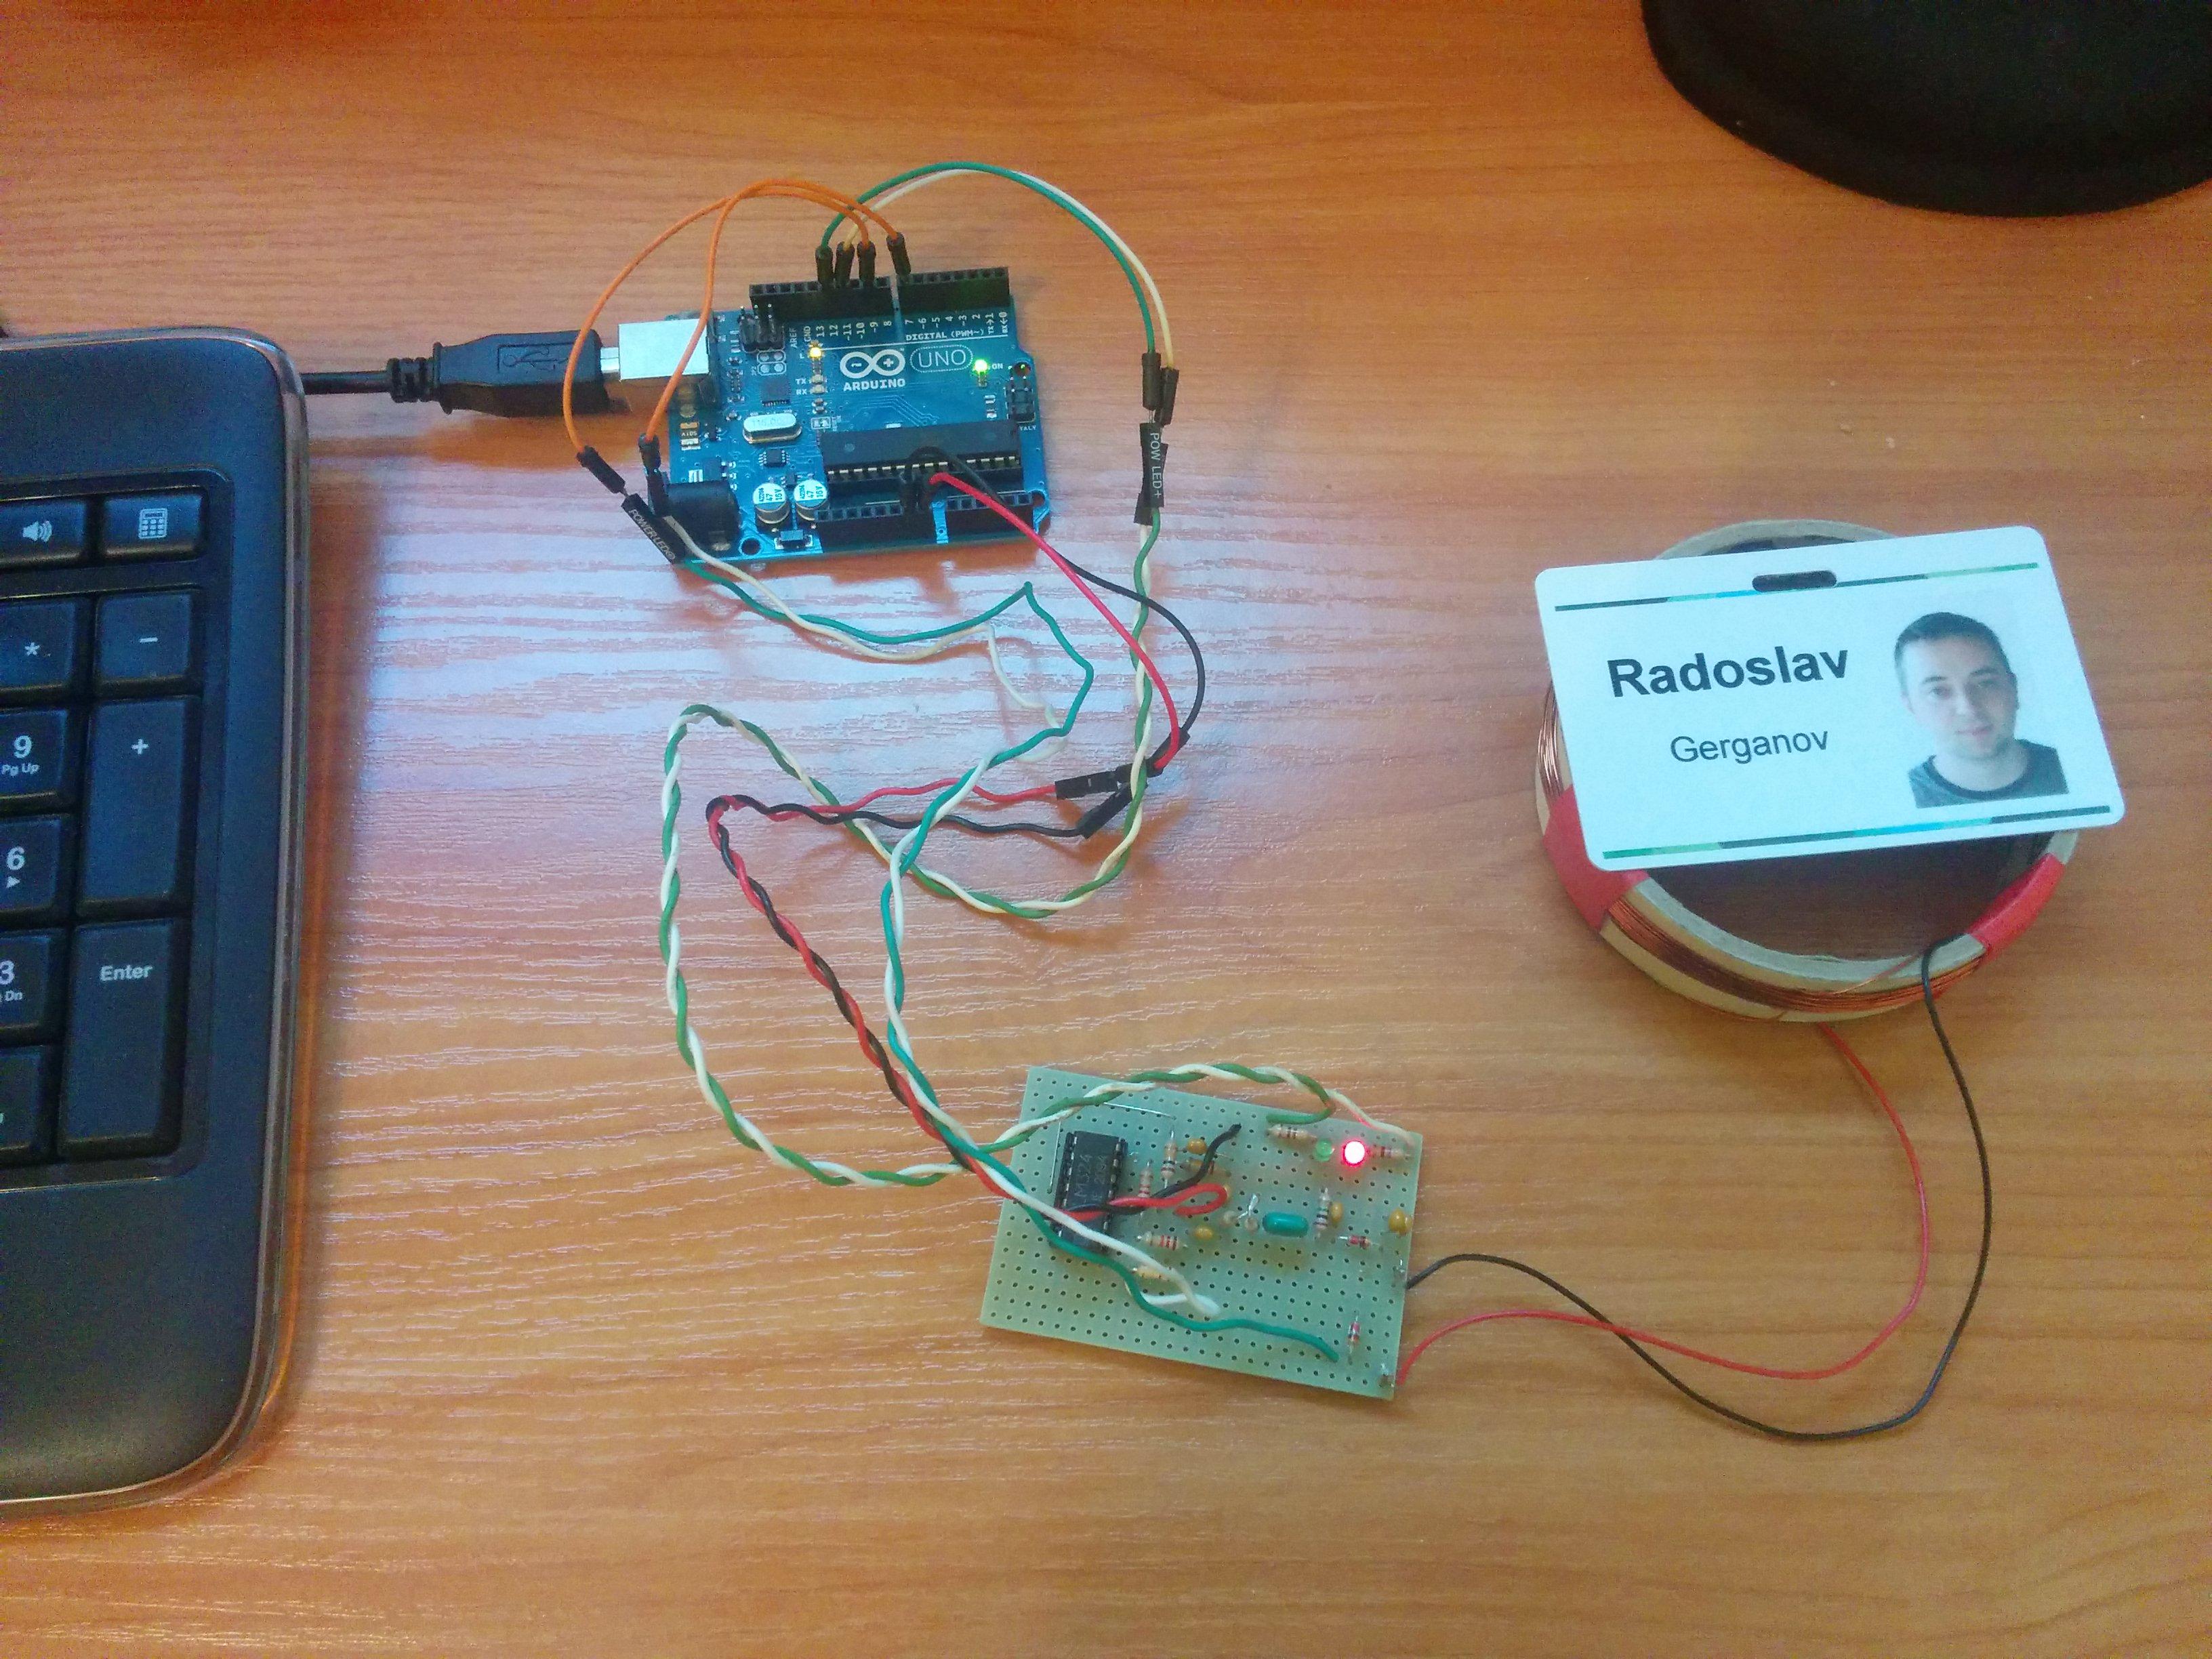 Surplustronics - Arduino